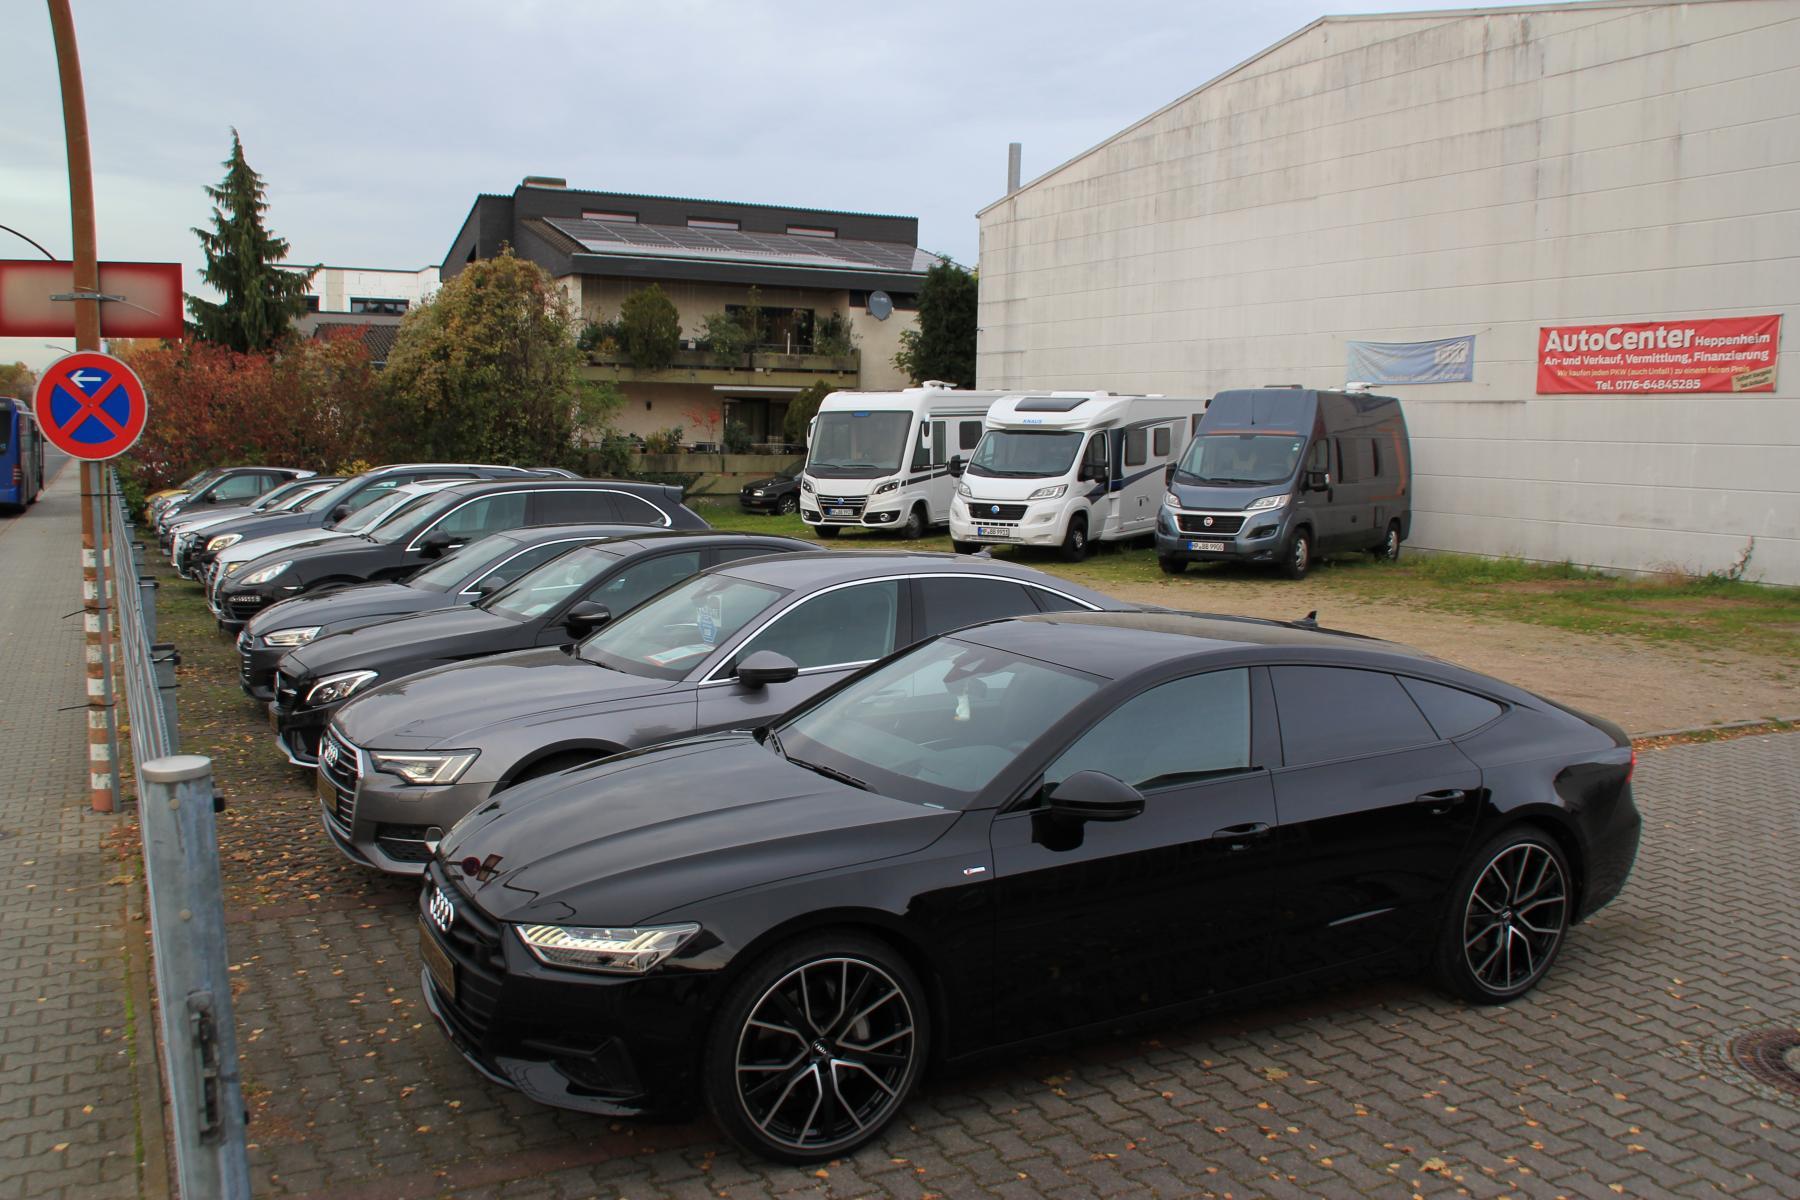 Willkommen bei Autocenter Heppenheim